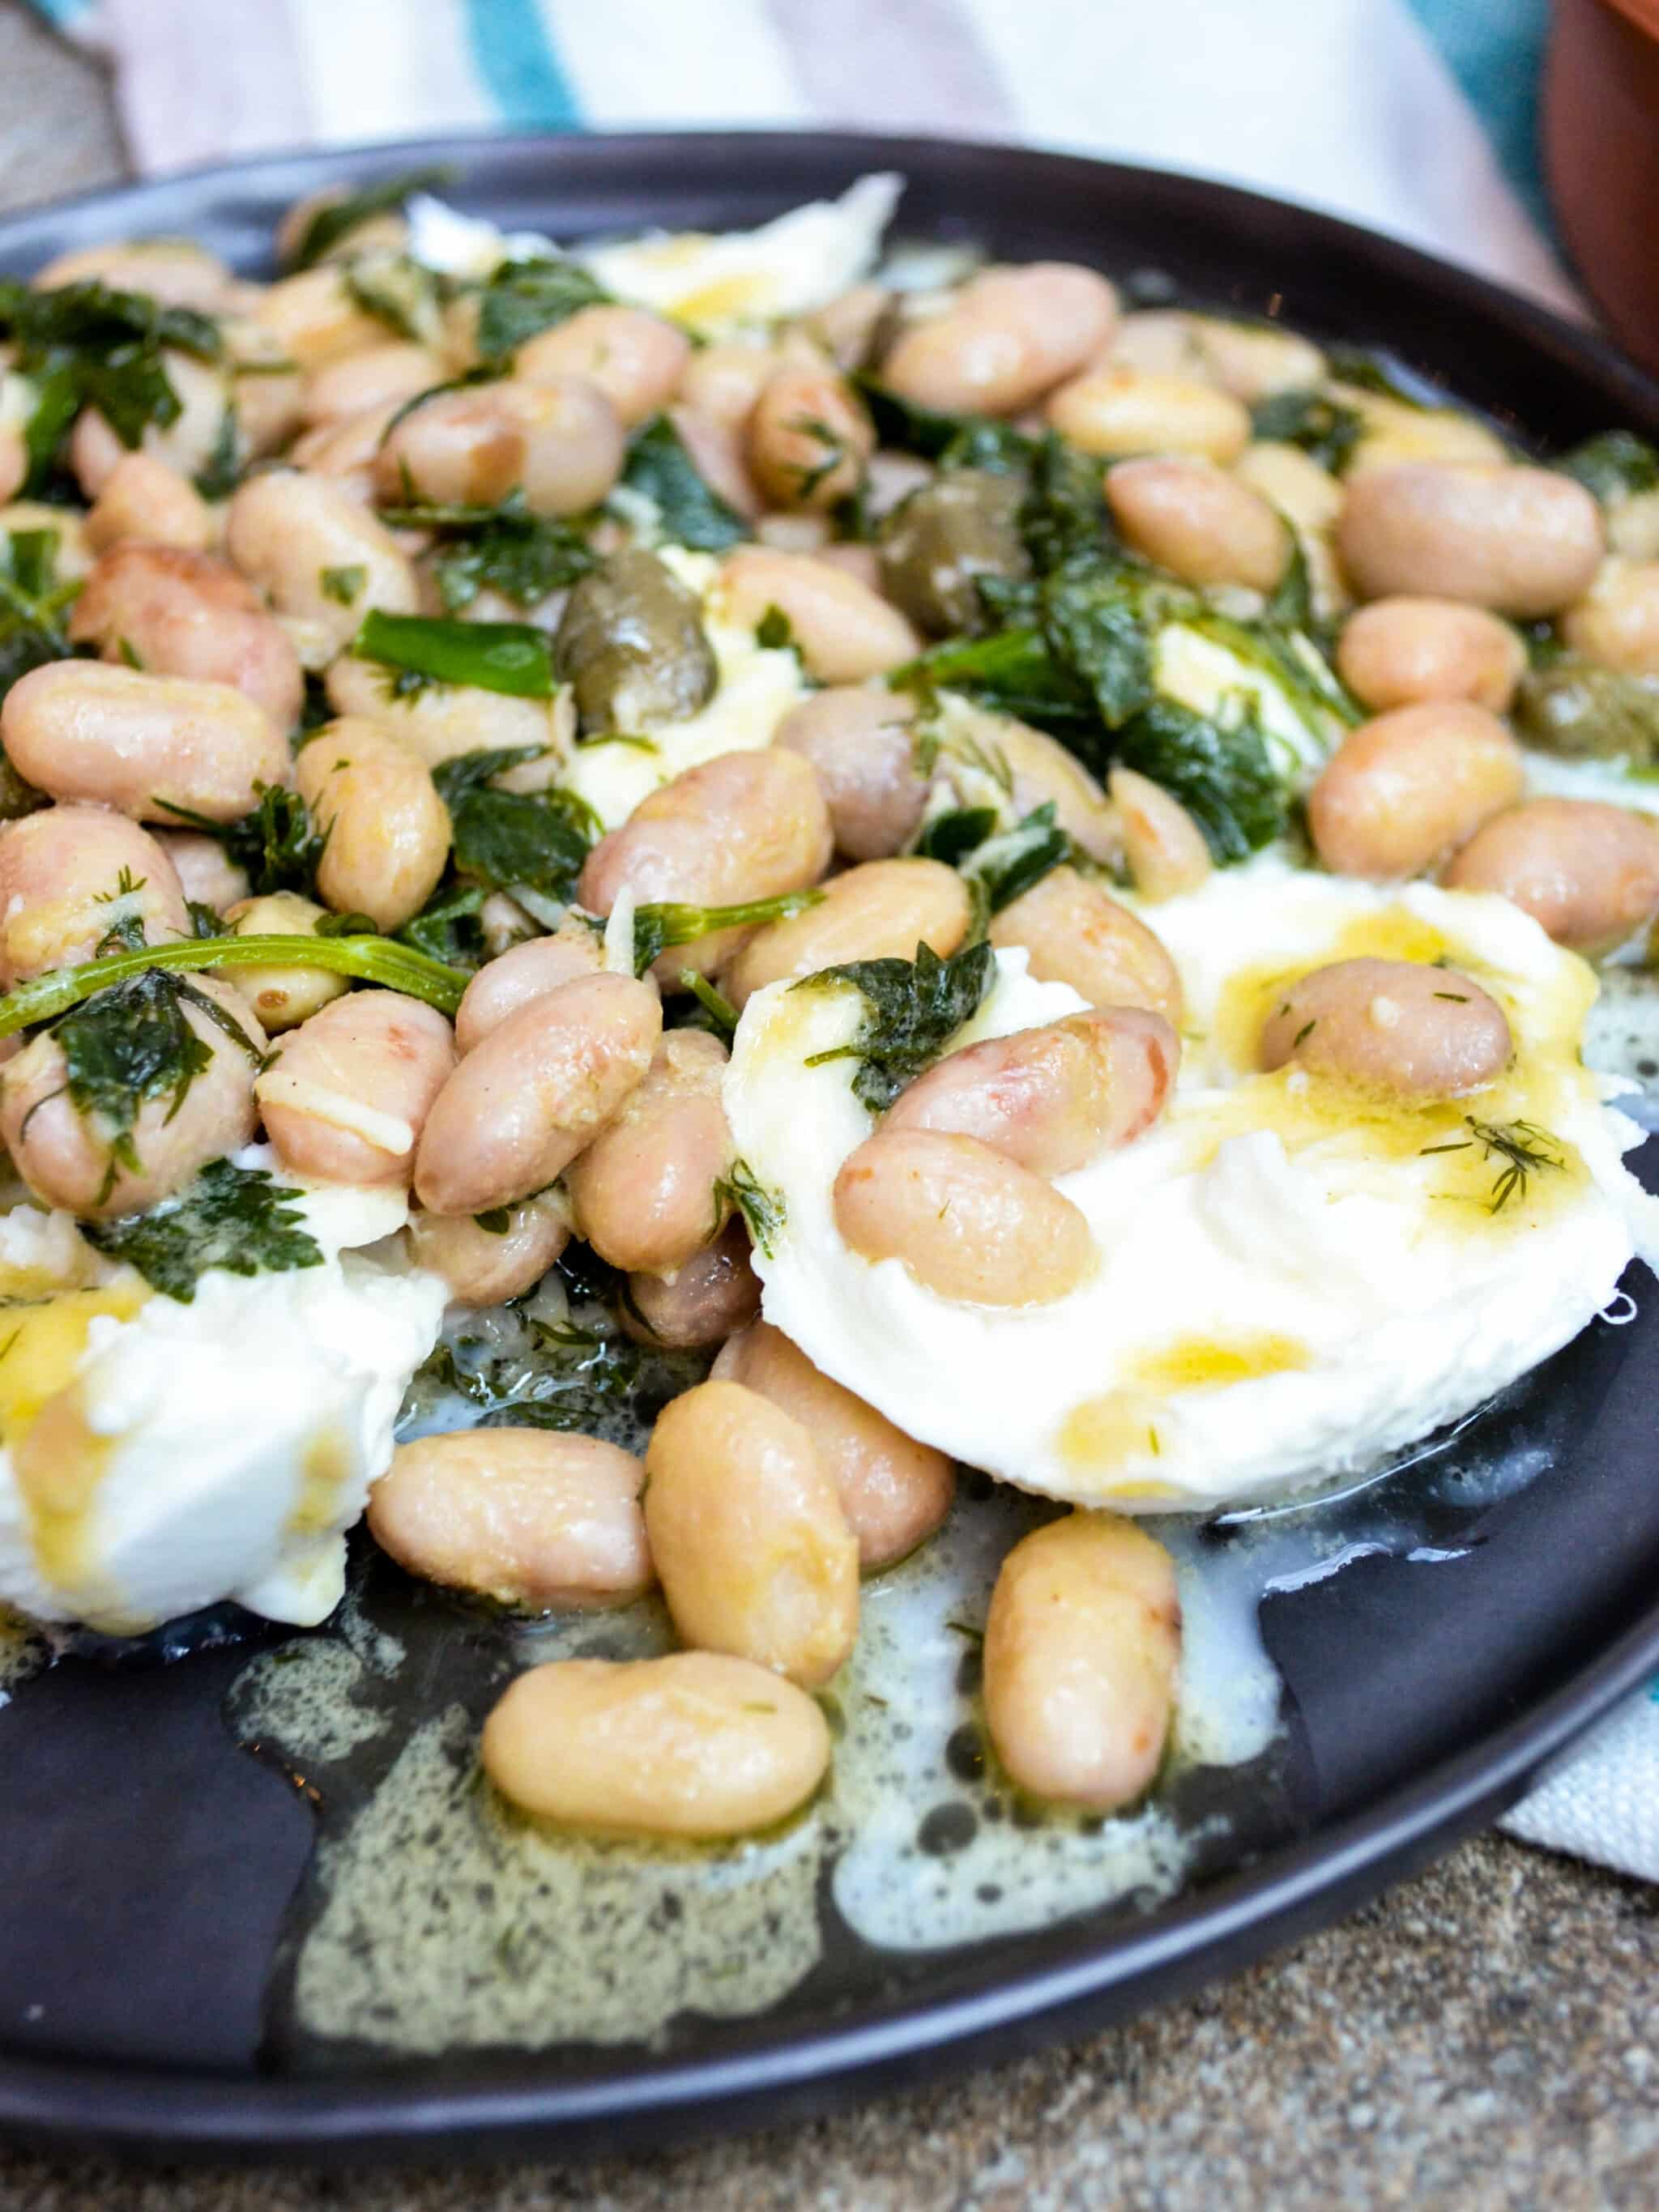 Borlotti Beans With Mozzarella A Kitchen In Istanbul A Kitchen